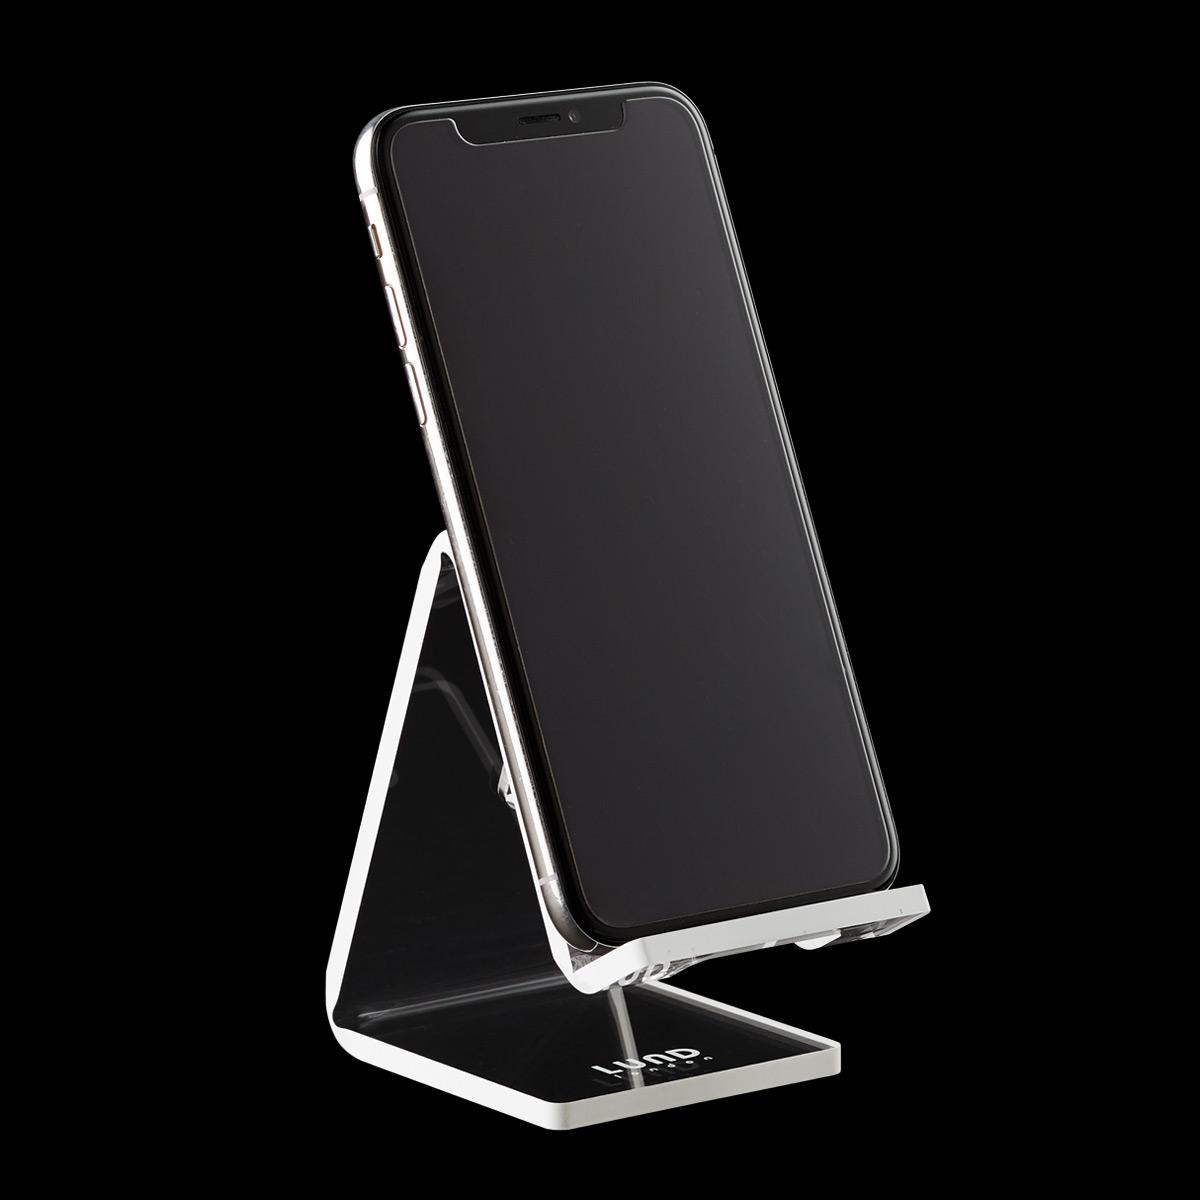 Mod Acrylic Phone Holder